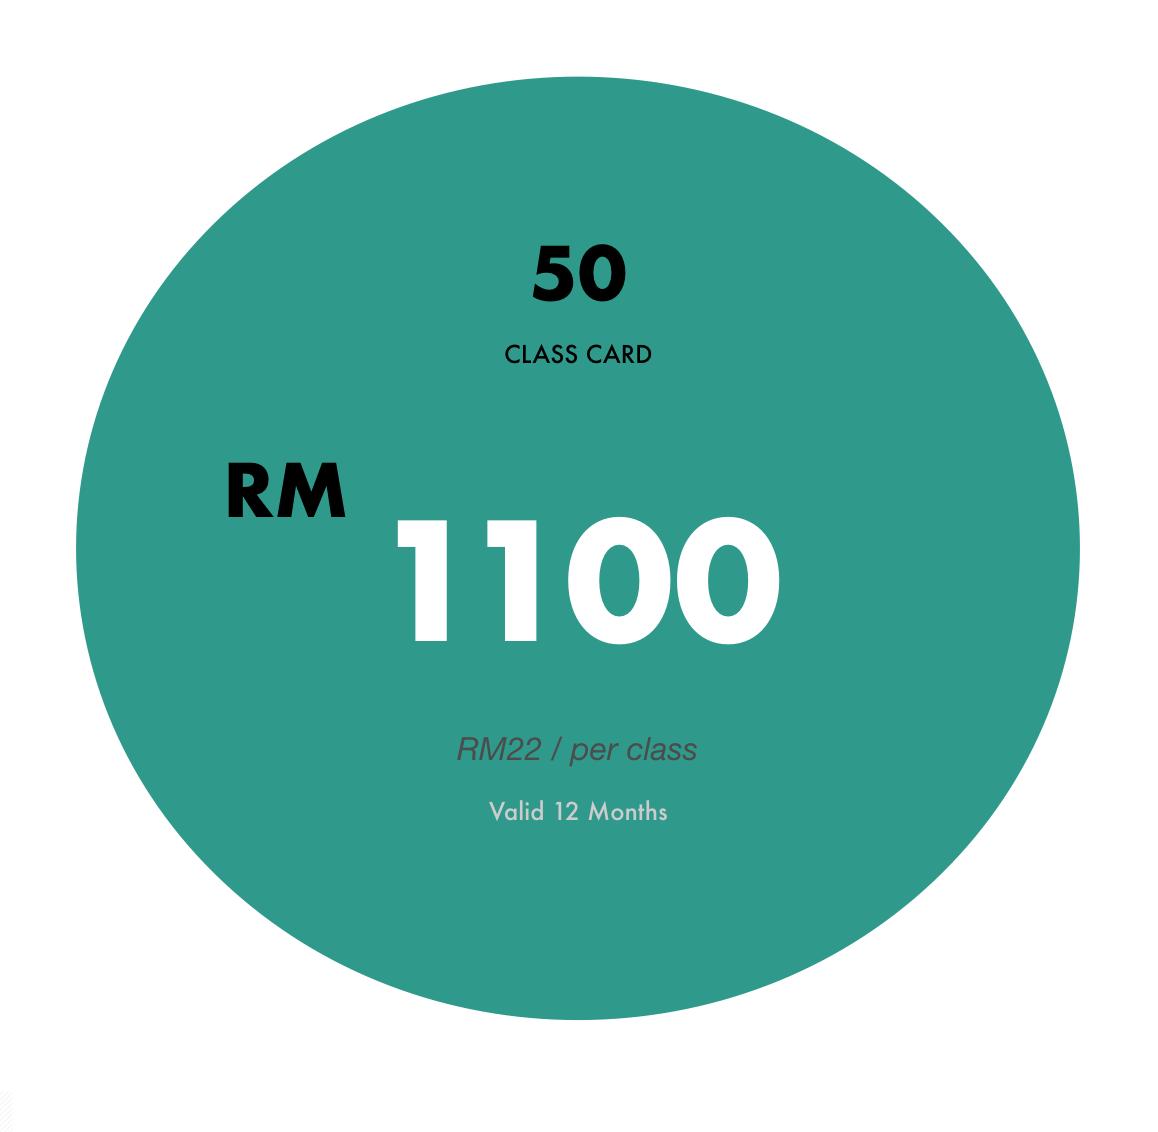 MYR21 Per Class